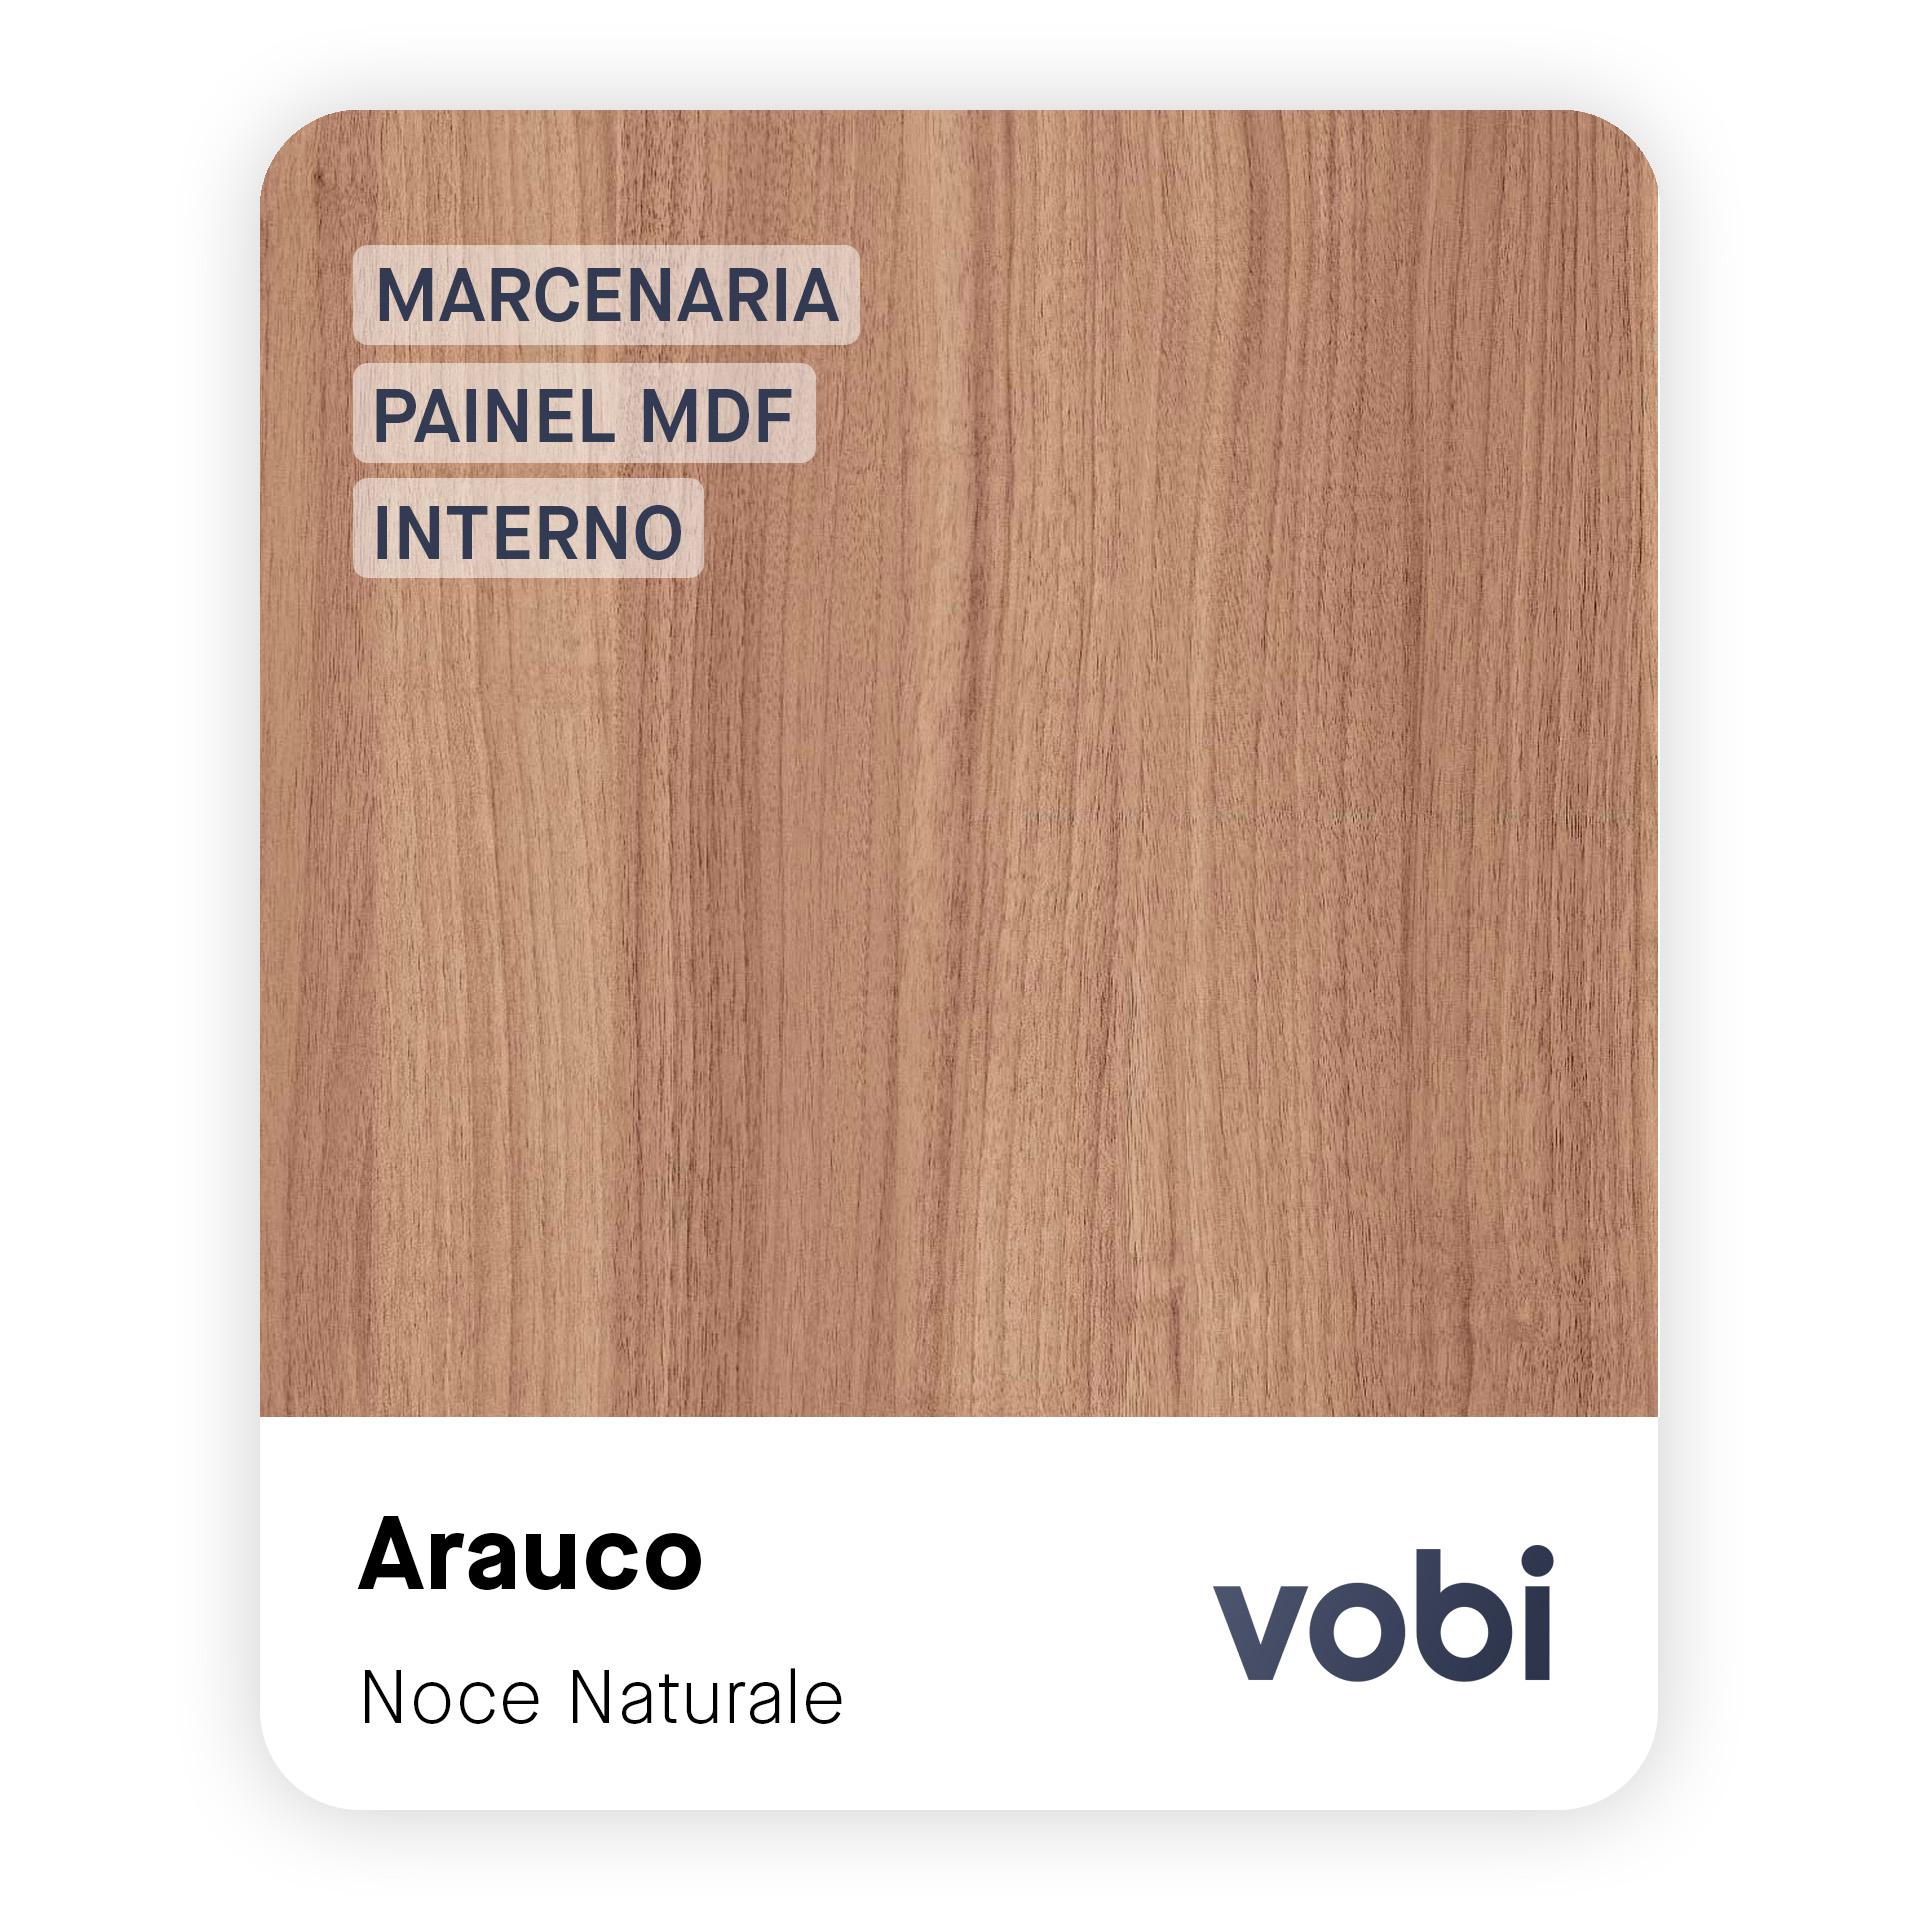 marcenaria painel mdf interno madeira noce naturale